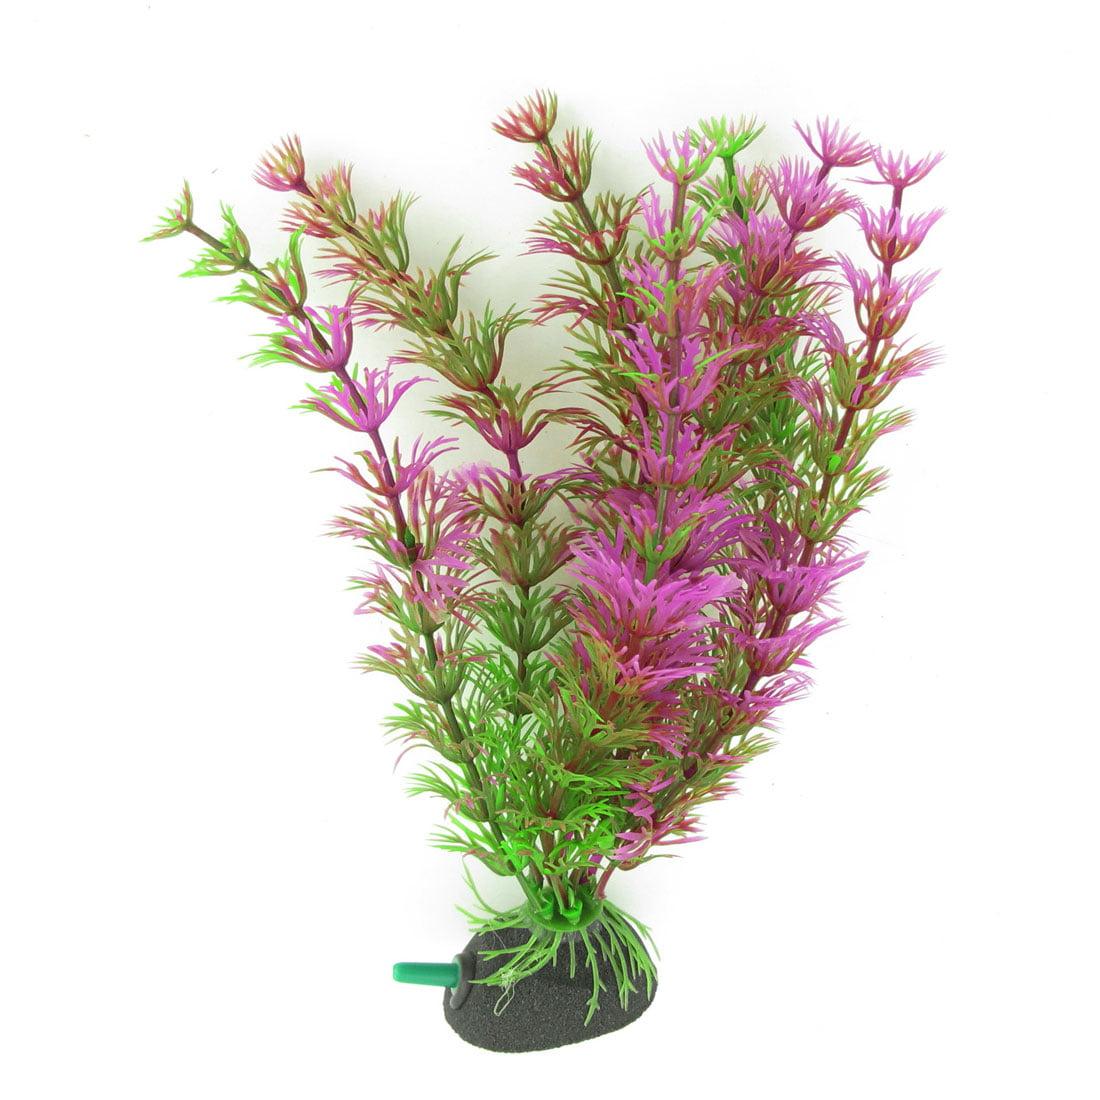 Unique Bargains 7.5 High Green Purple Emulational Plants Adornment for Fish Tank